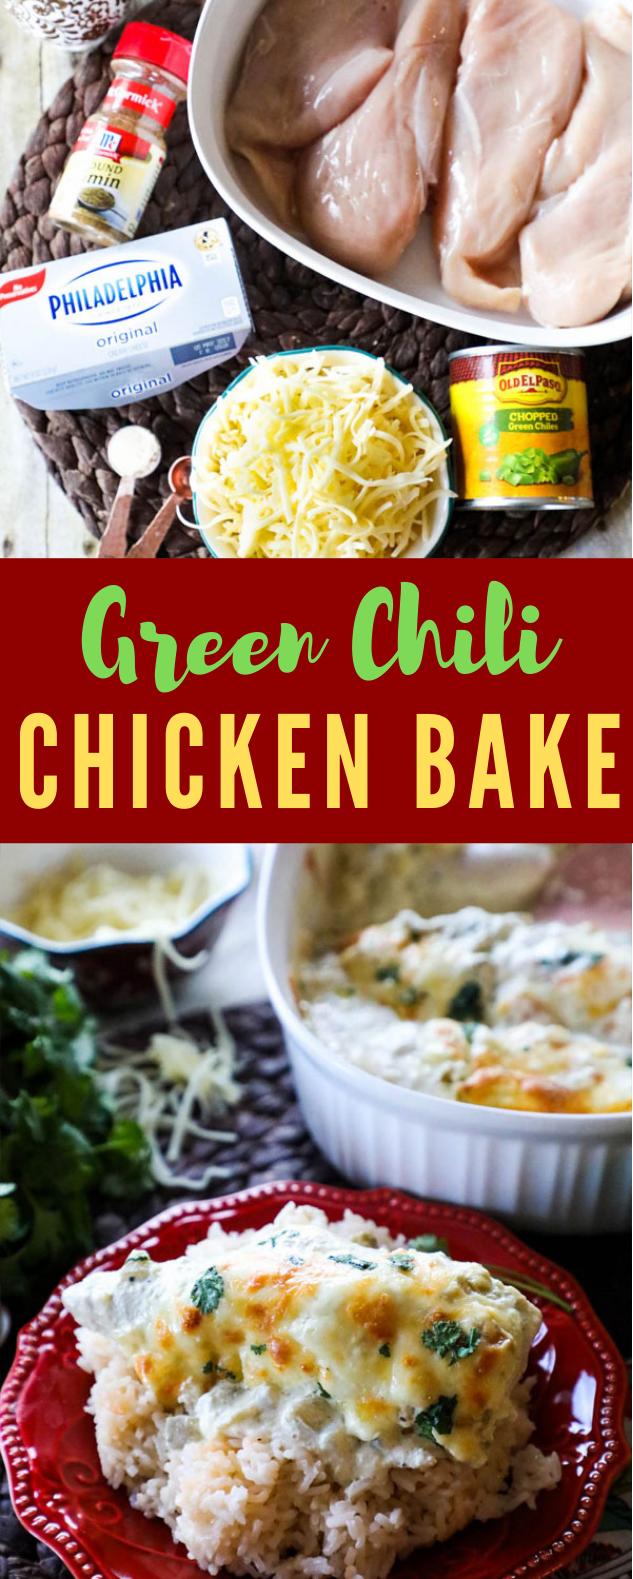 GREEN CHILI CHICKEN BAKE RECIPE GREEN CHILI CHICKEN BAKE RECIPE